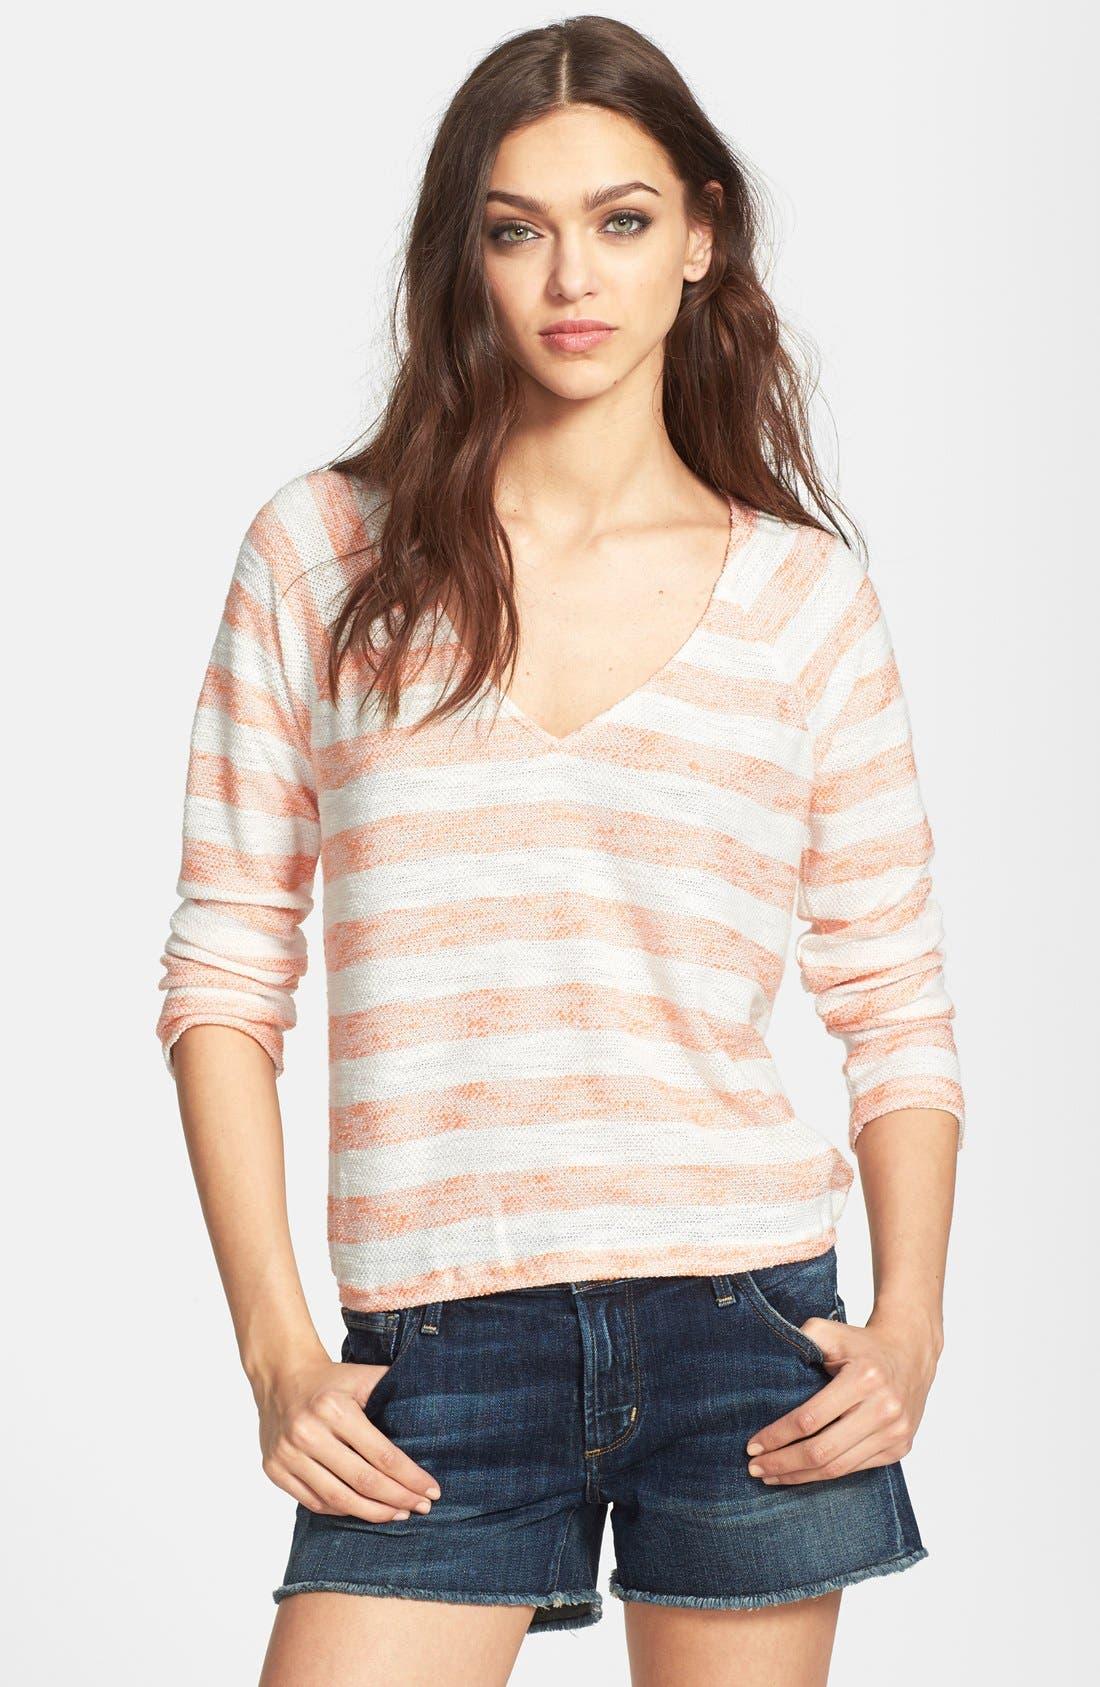 SANCTUARY, 'Beach' V-Neck Knit Sweater, Main thumbnail 1, color, 832